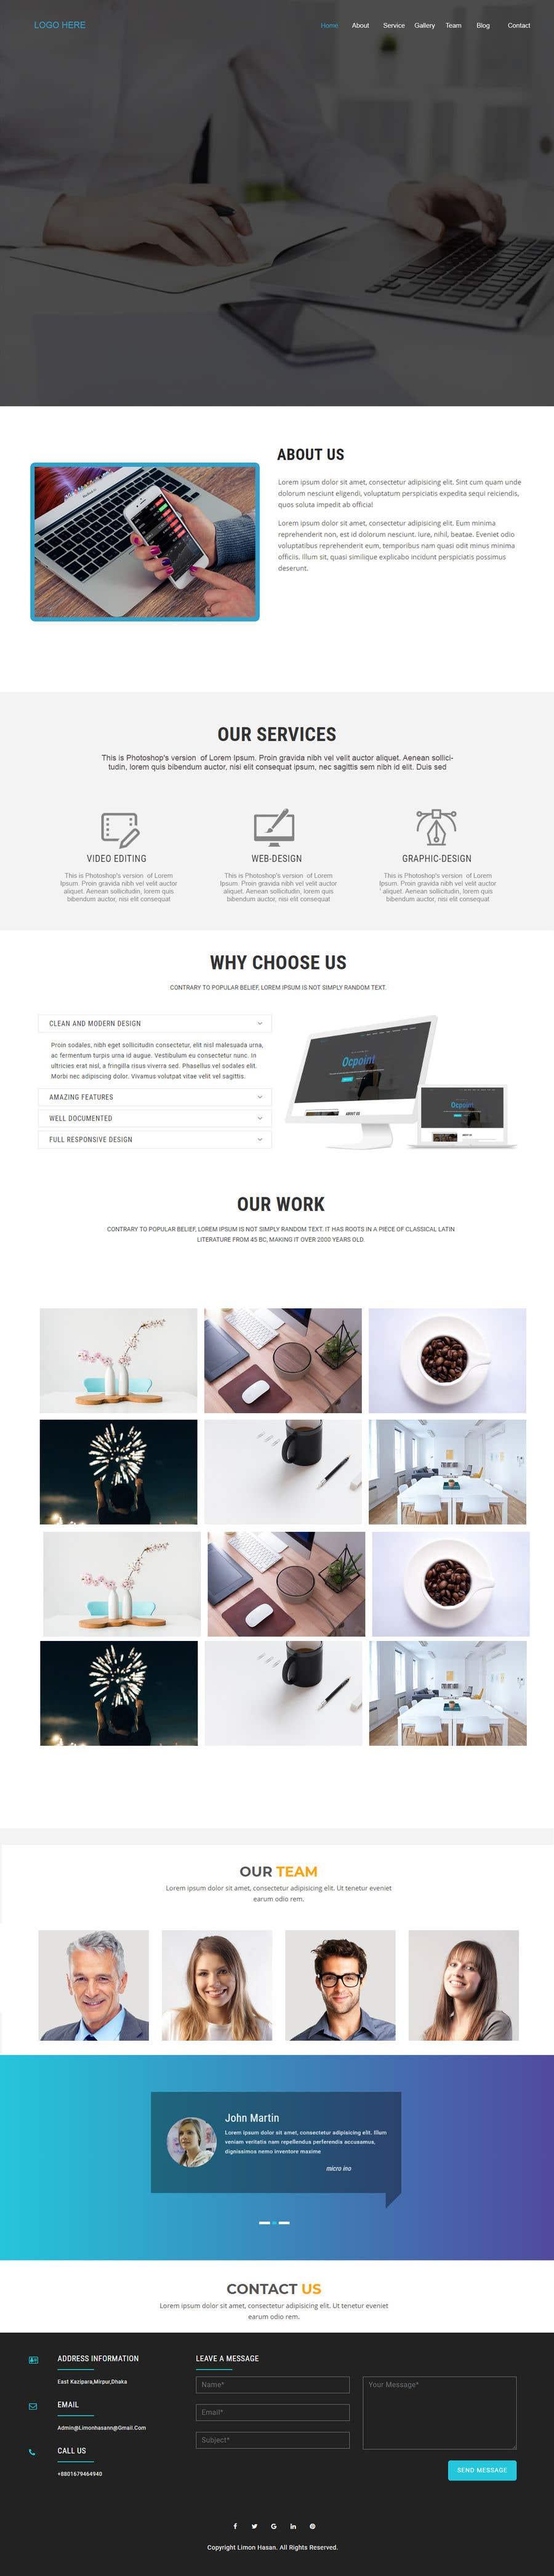 Proposition n°3 du concours Divi 3 Expert with Impressive Design Skills